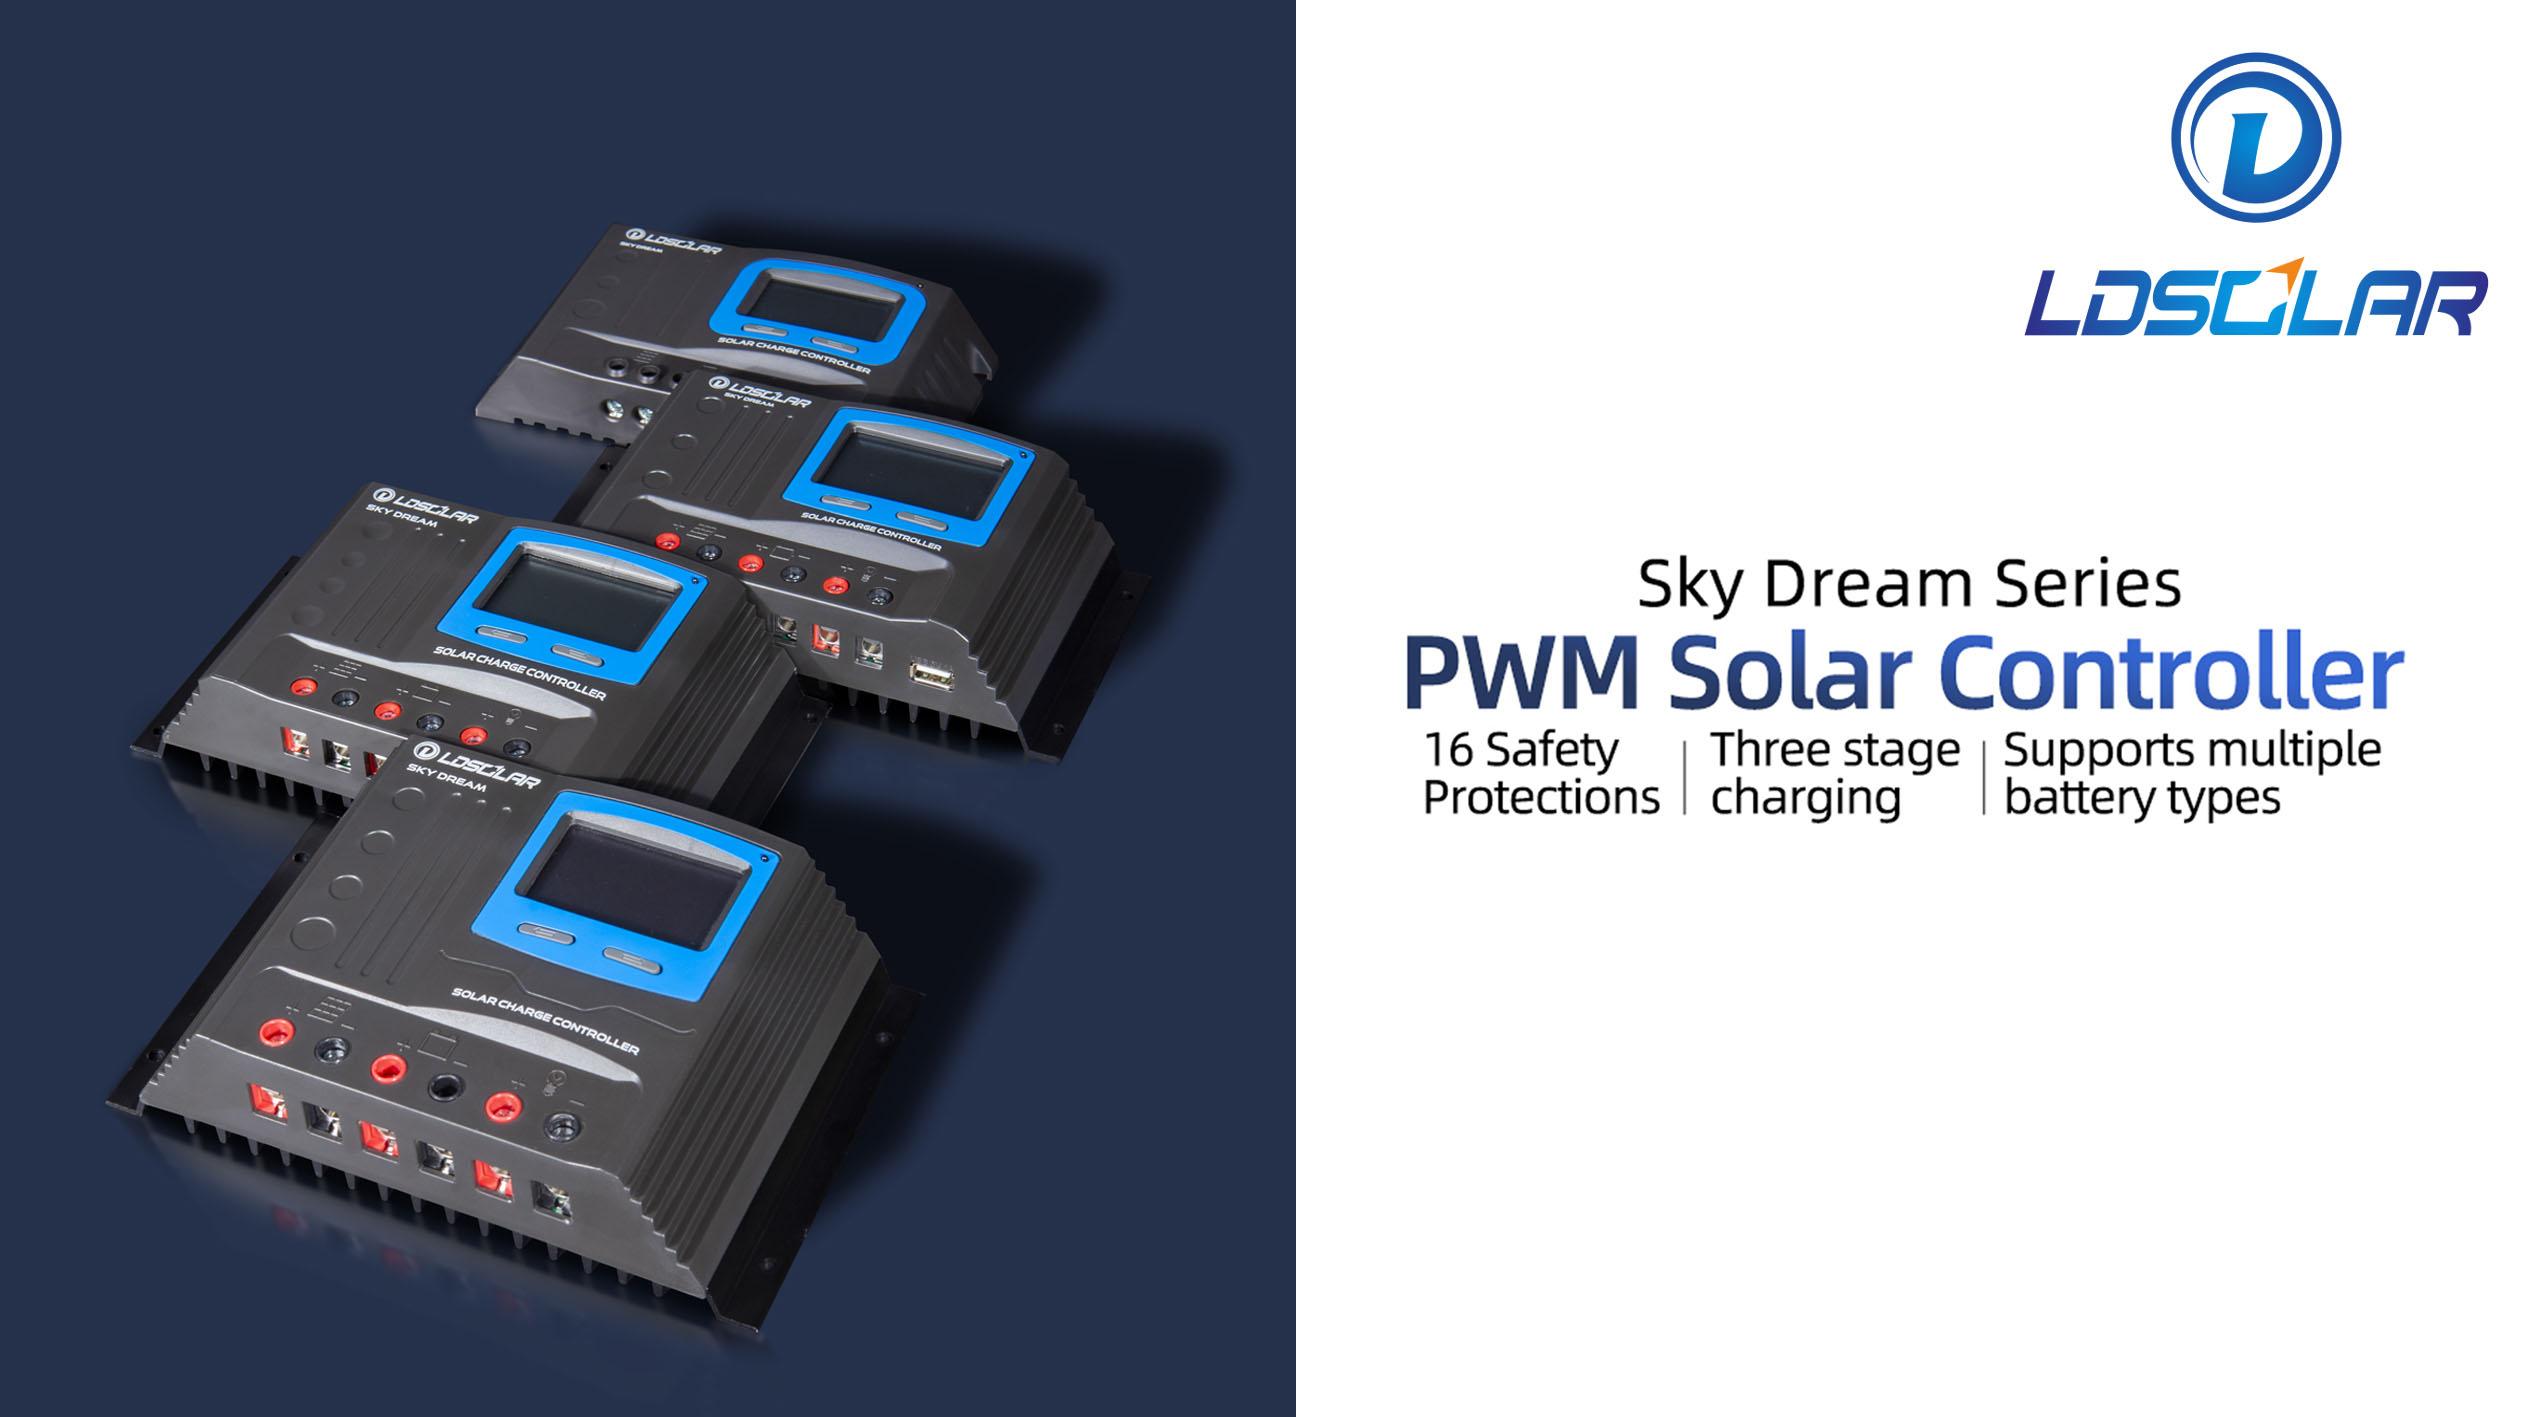 Controlador solar PWM de la serie Sky Dream